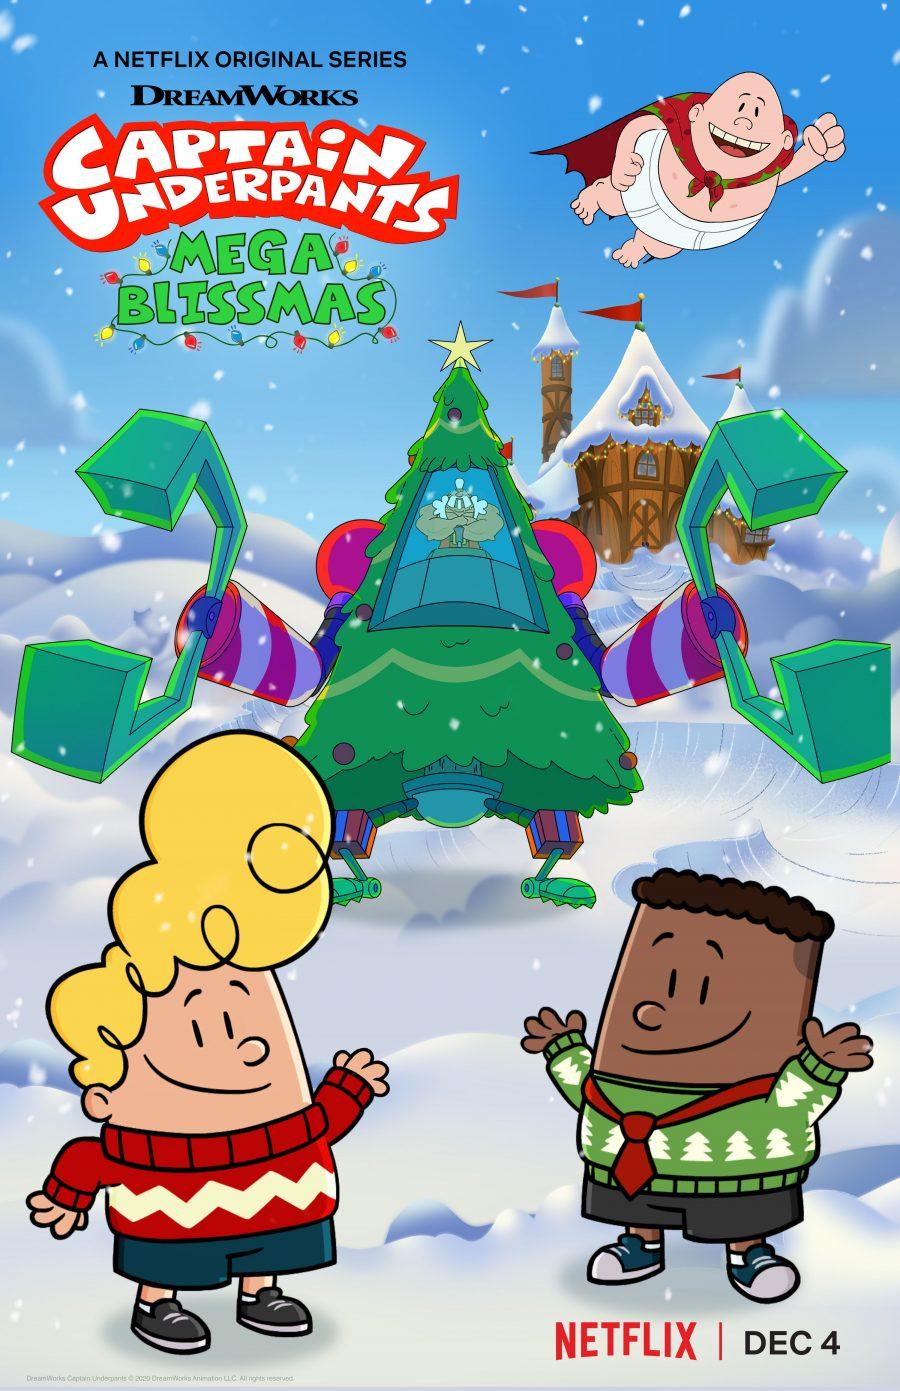 Captain Underpants: Mega Blissmas Holiday Special Release Date: December 4 Platform: Netflix